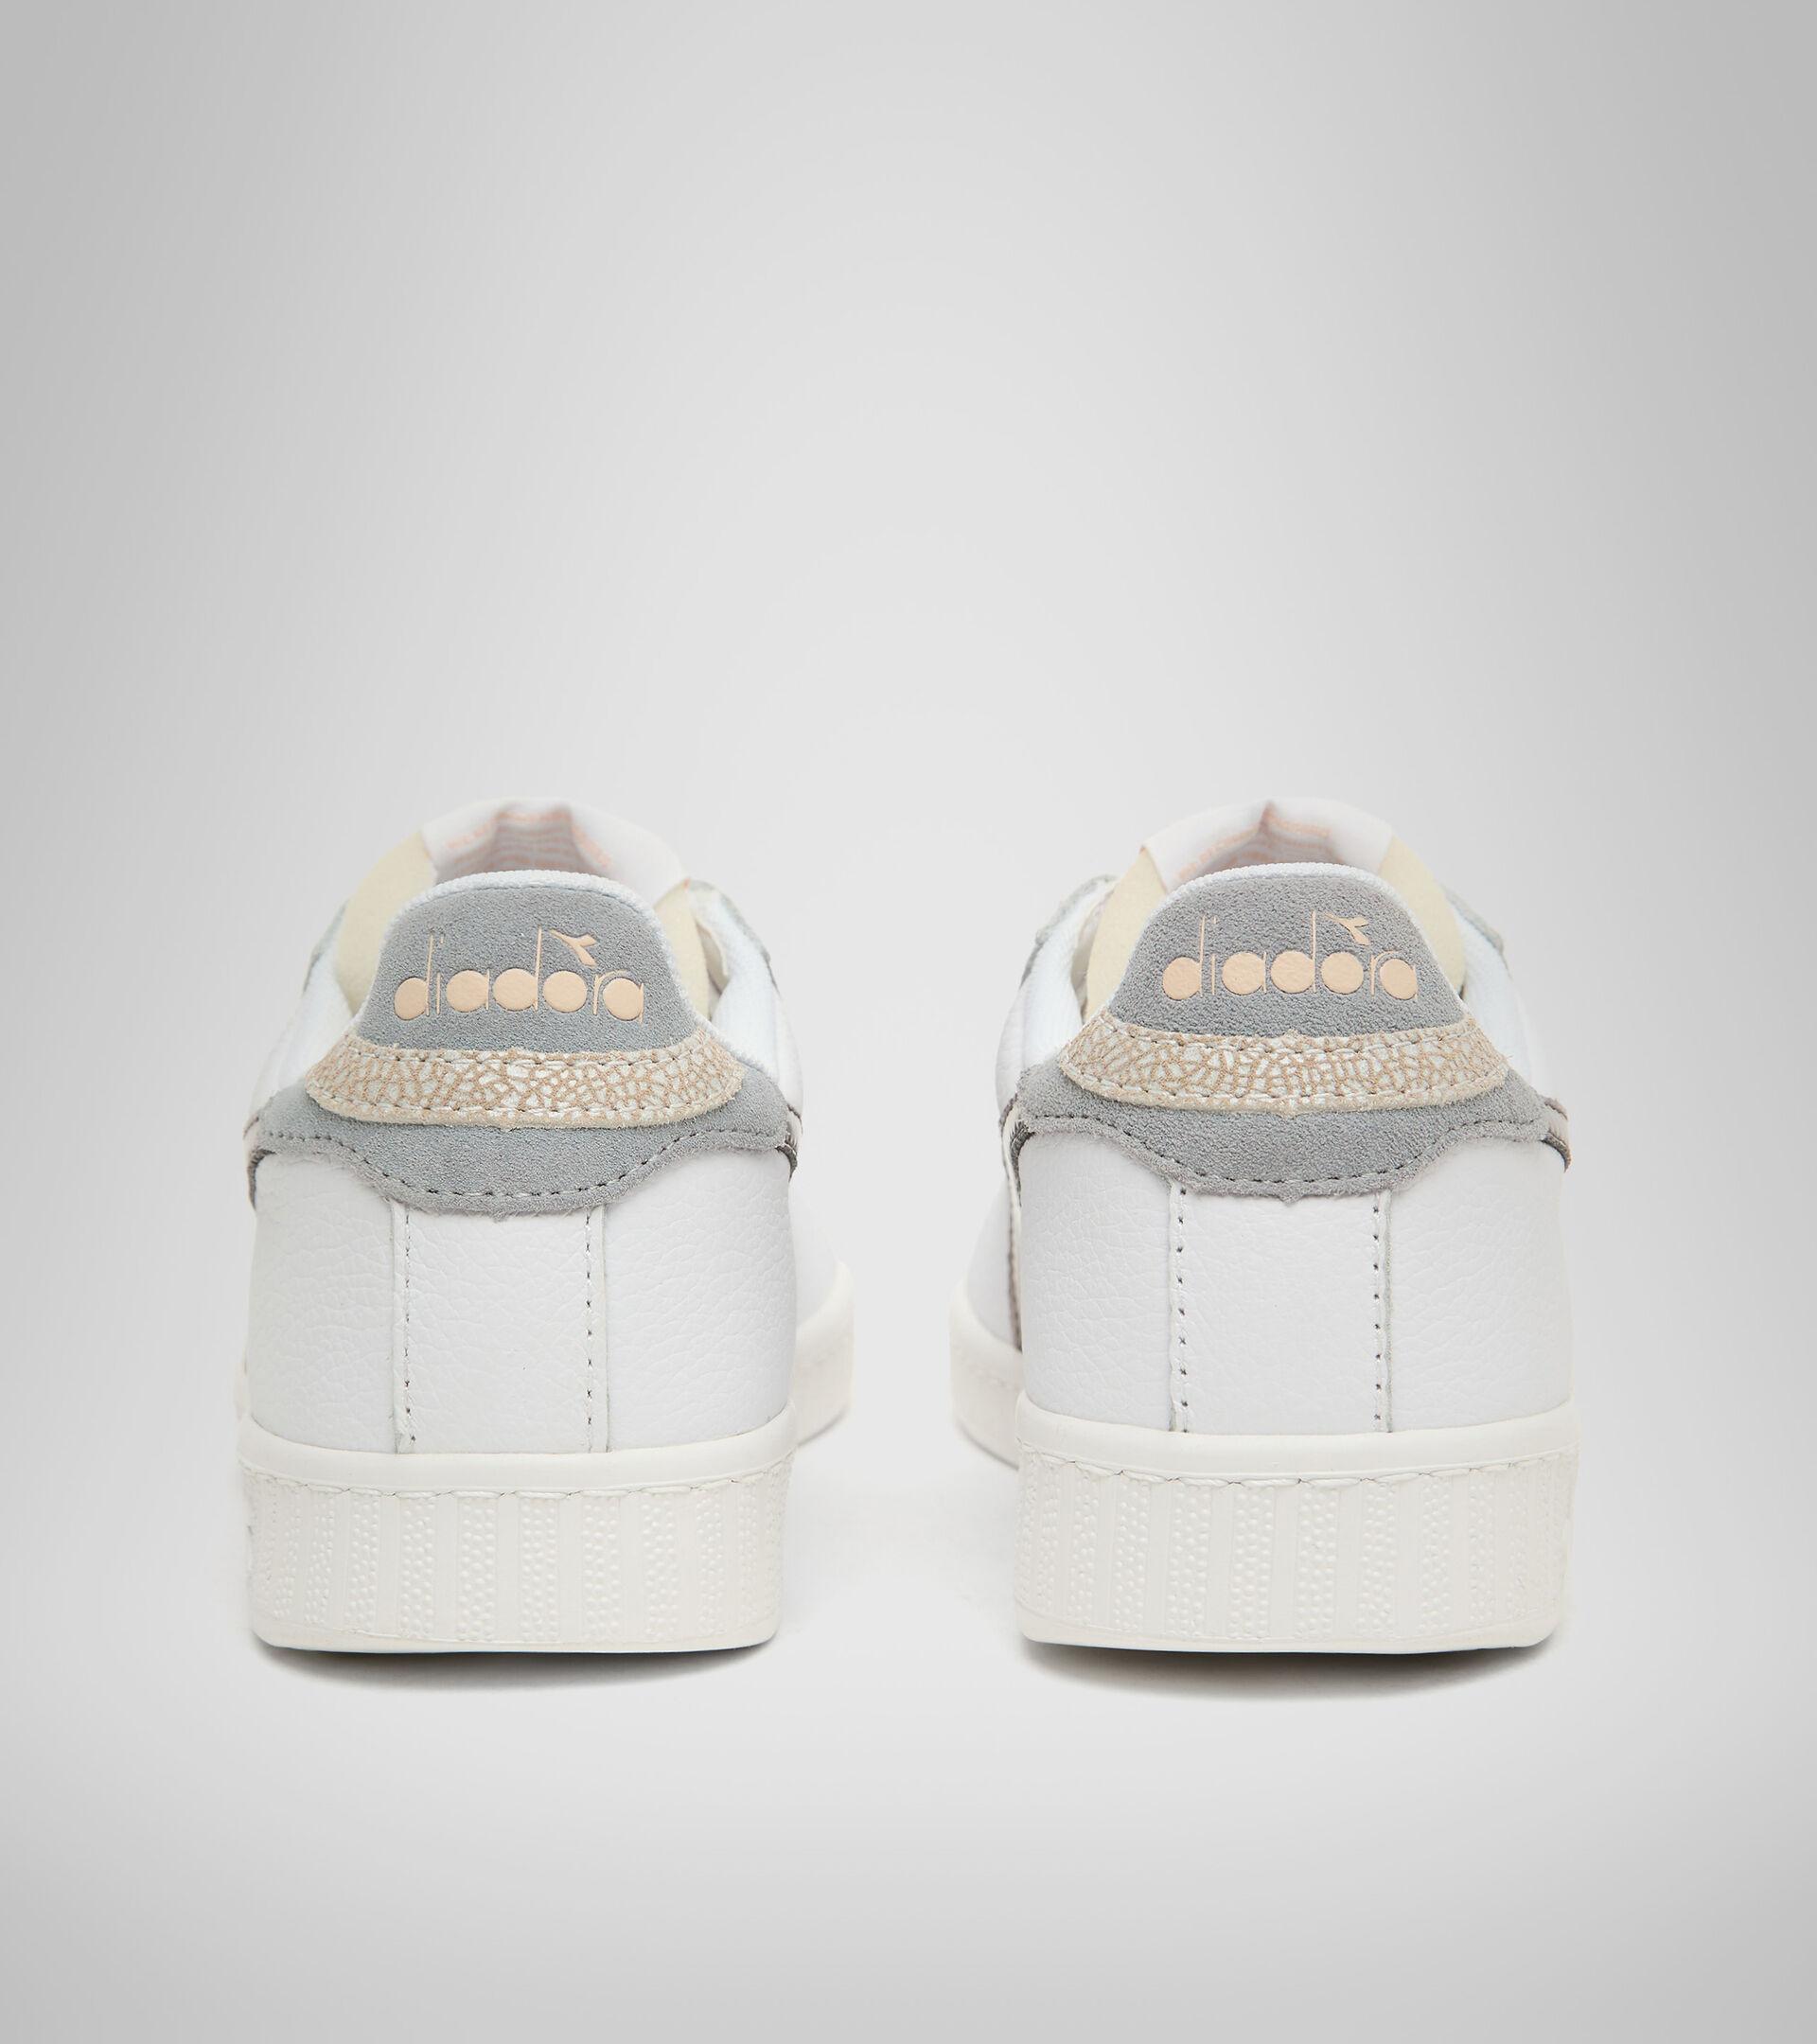 Footwear Sportswear DONNA GAME L LOW ICONA GLOSSY WN BLANCO/PLATA Diadora